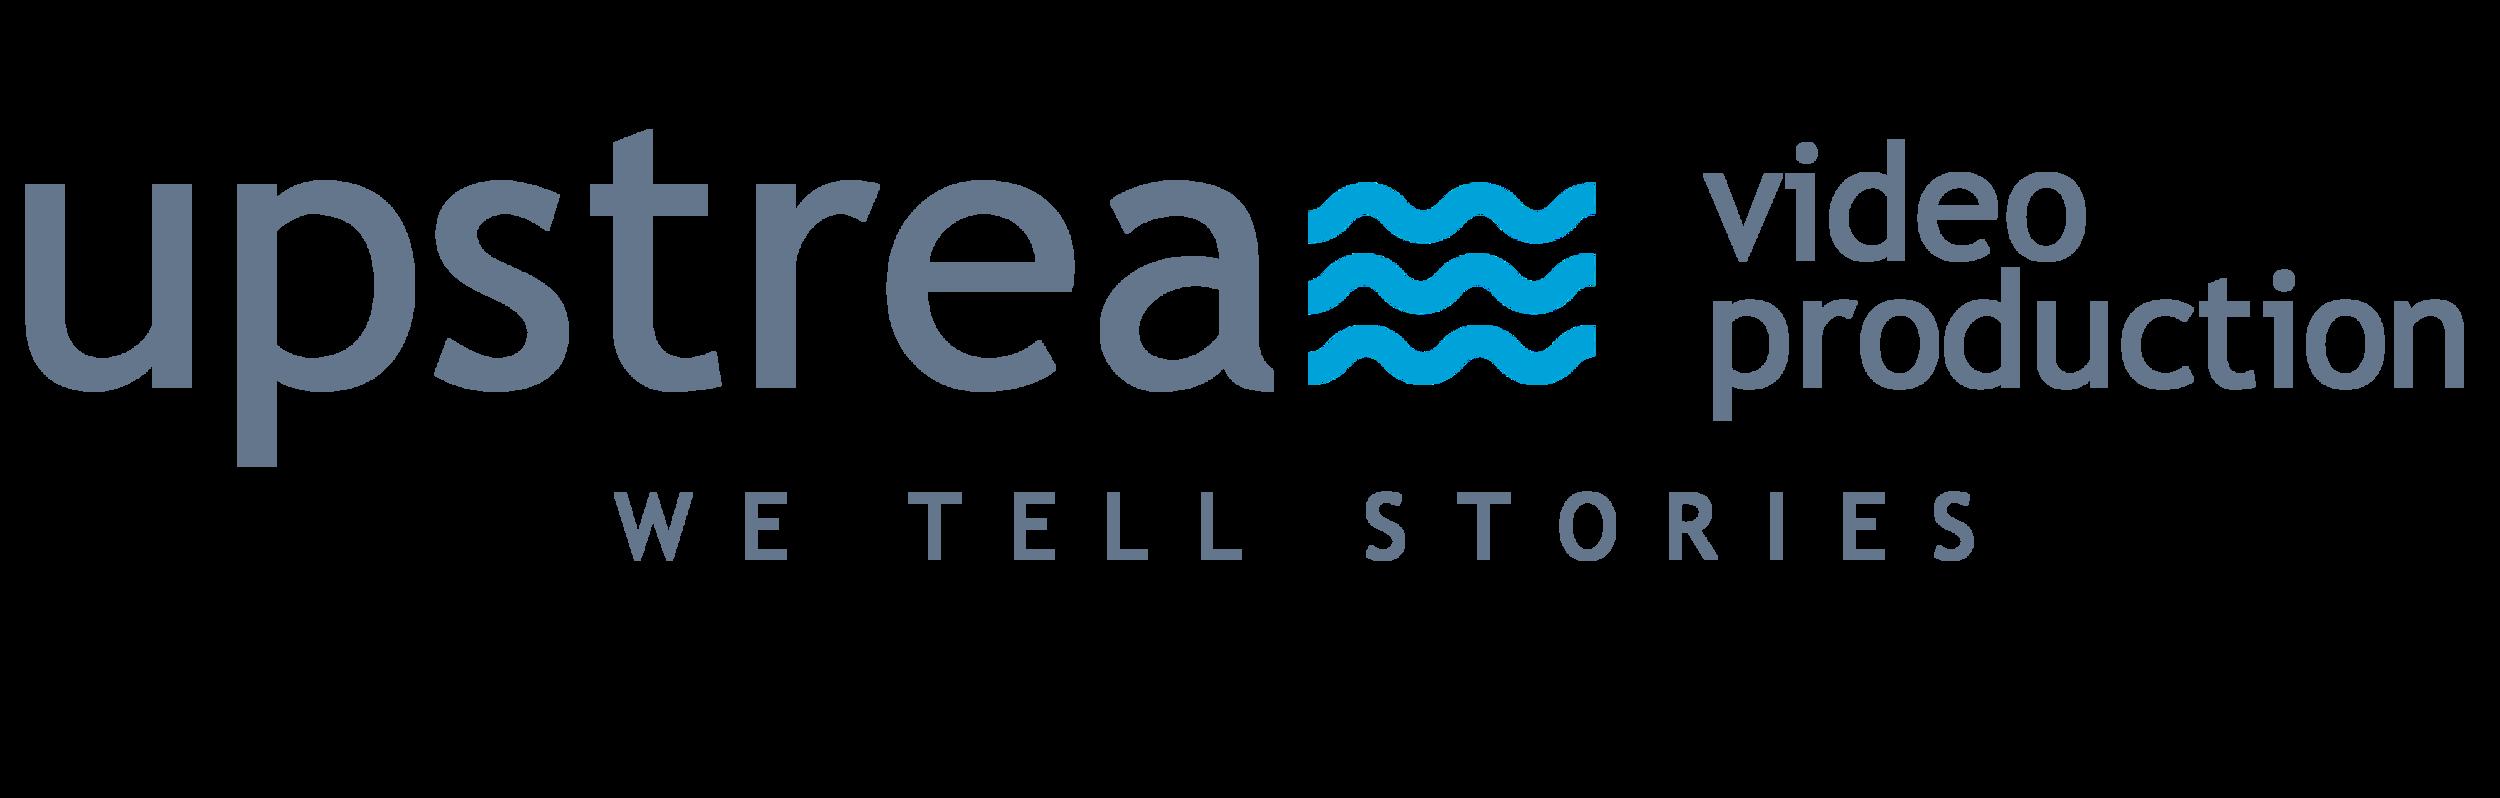 upstream video production